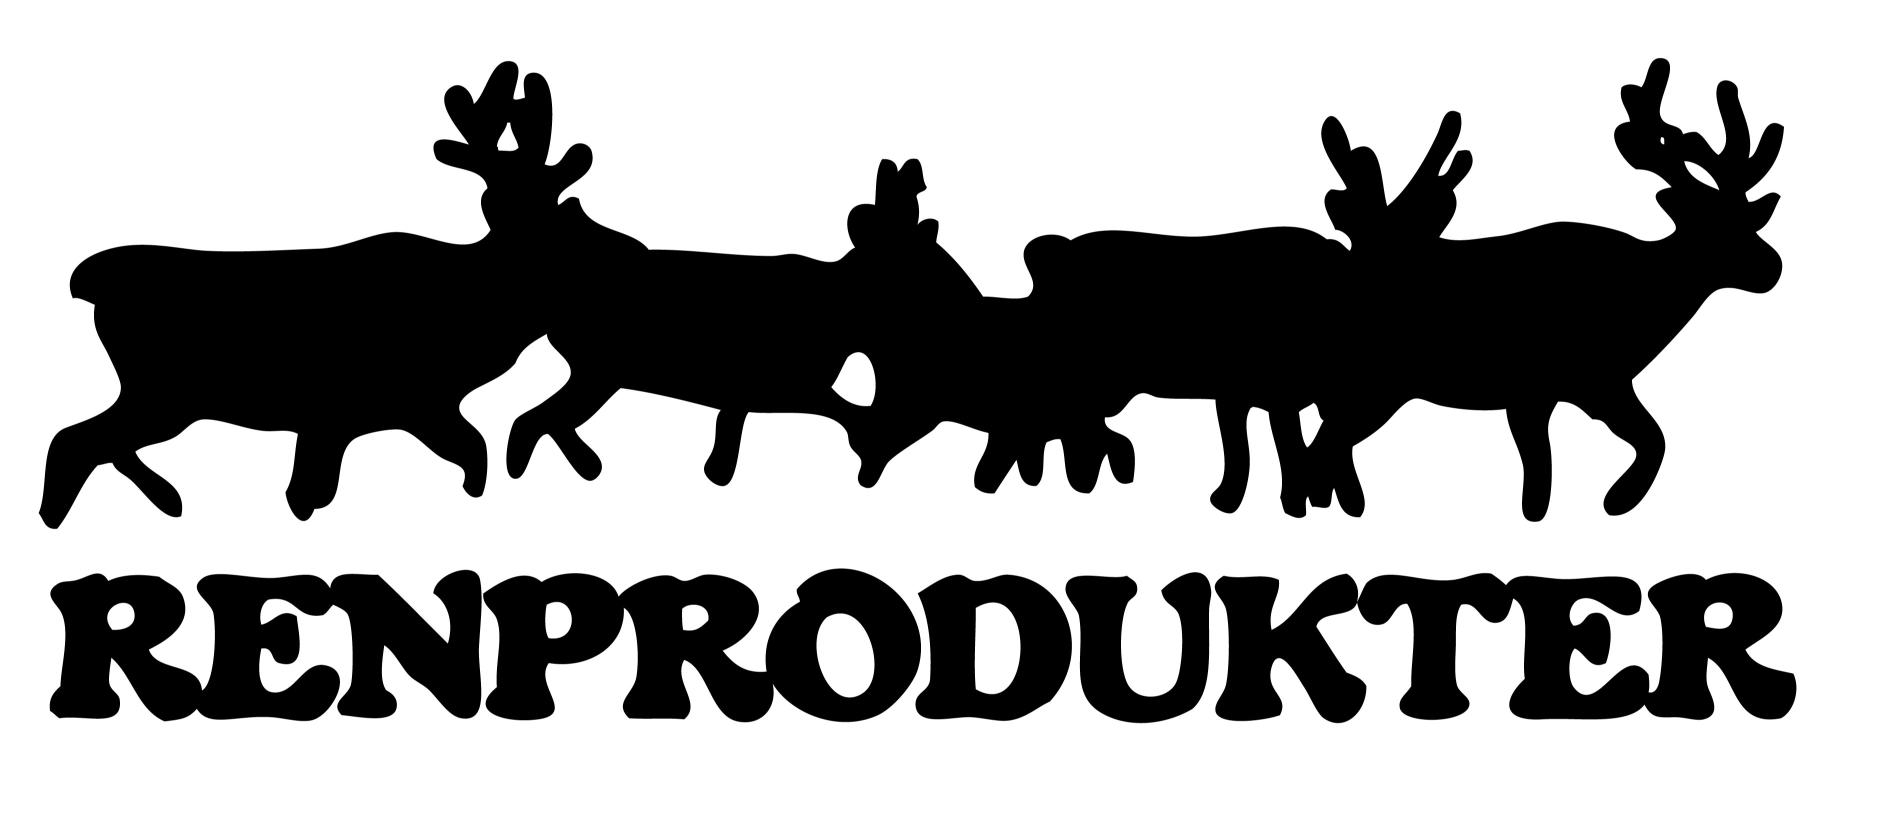 Renprodukter